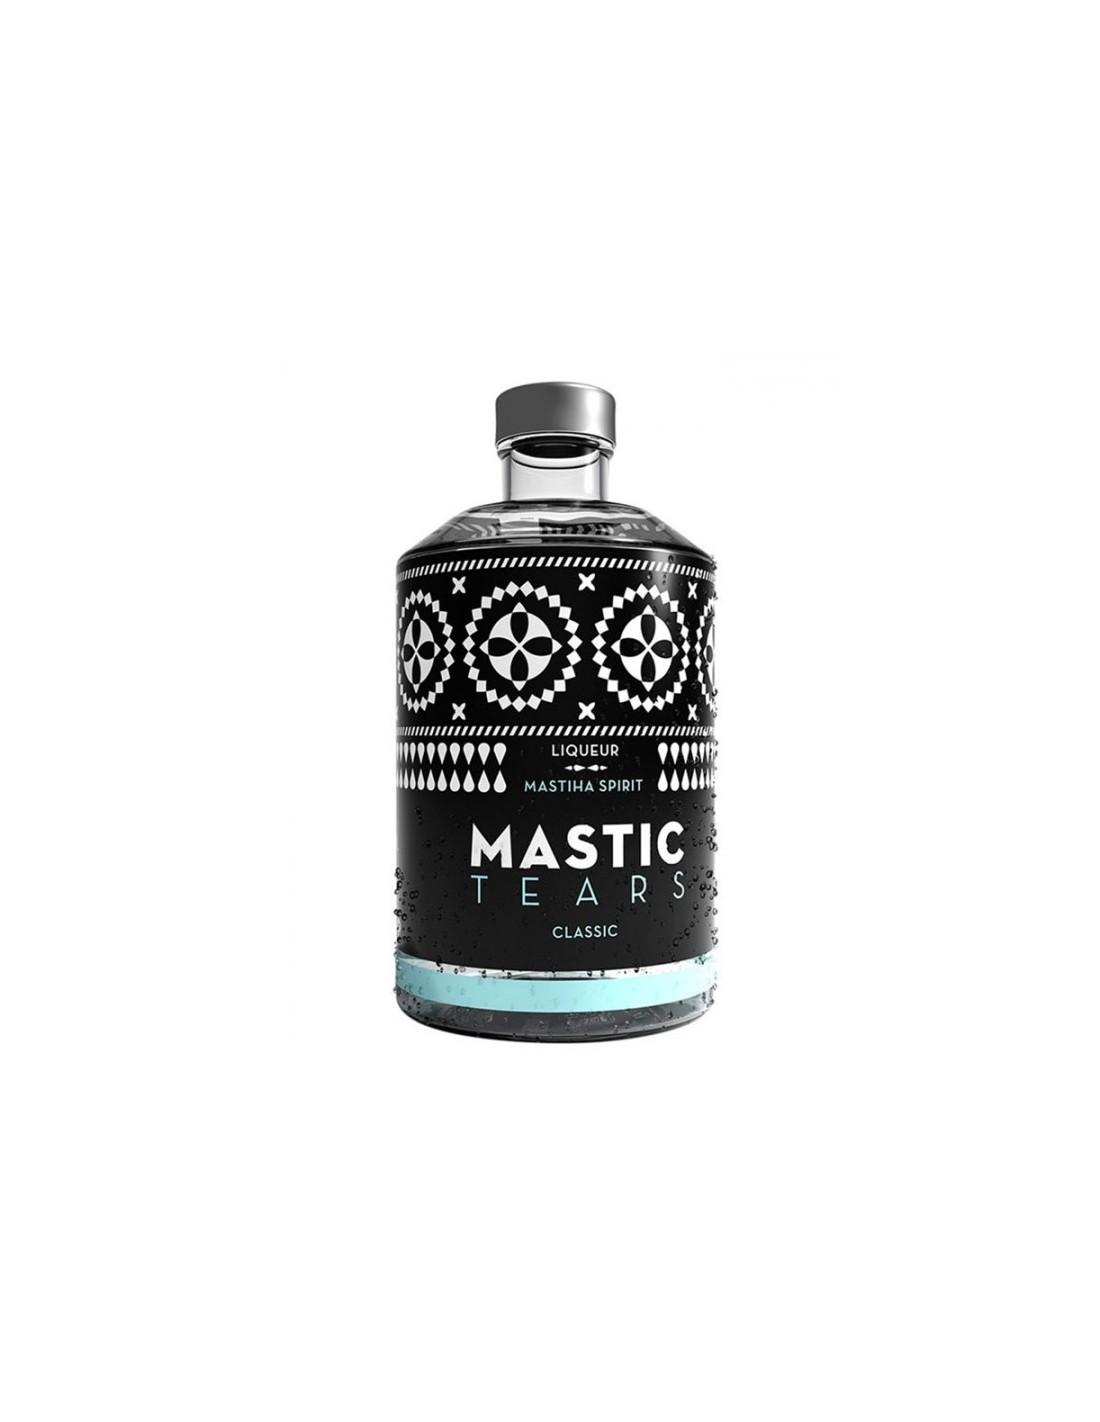 Lichior Mastic Tears Classic 0.7L